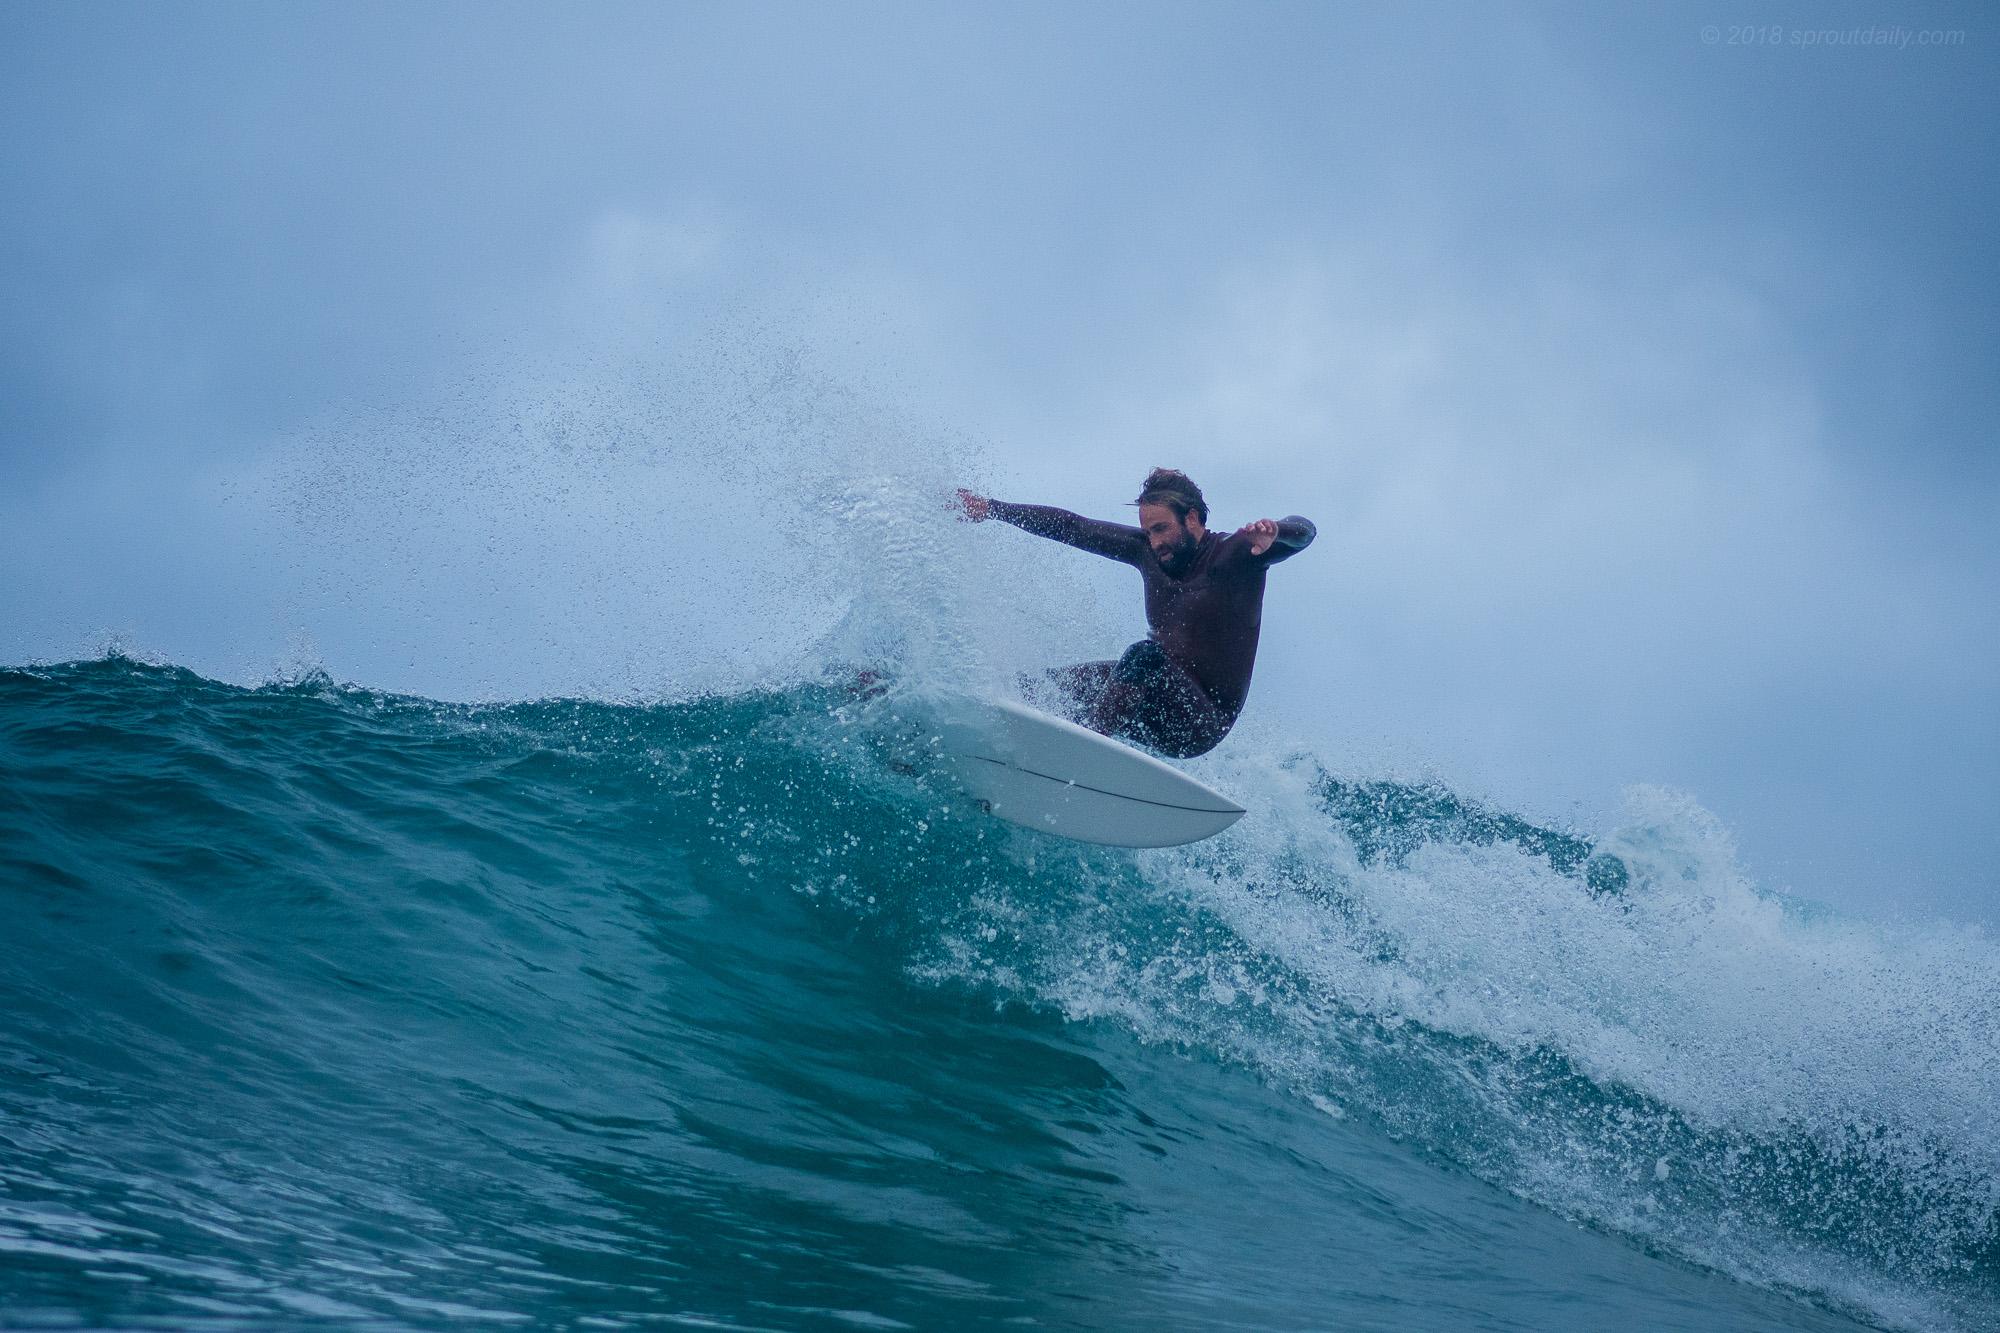 Craig jamming on three fins